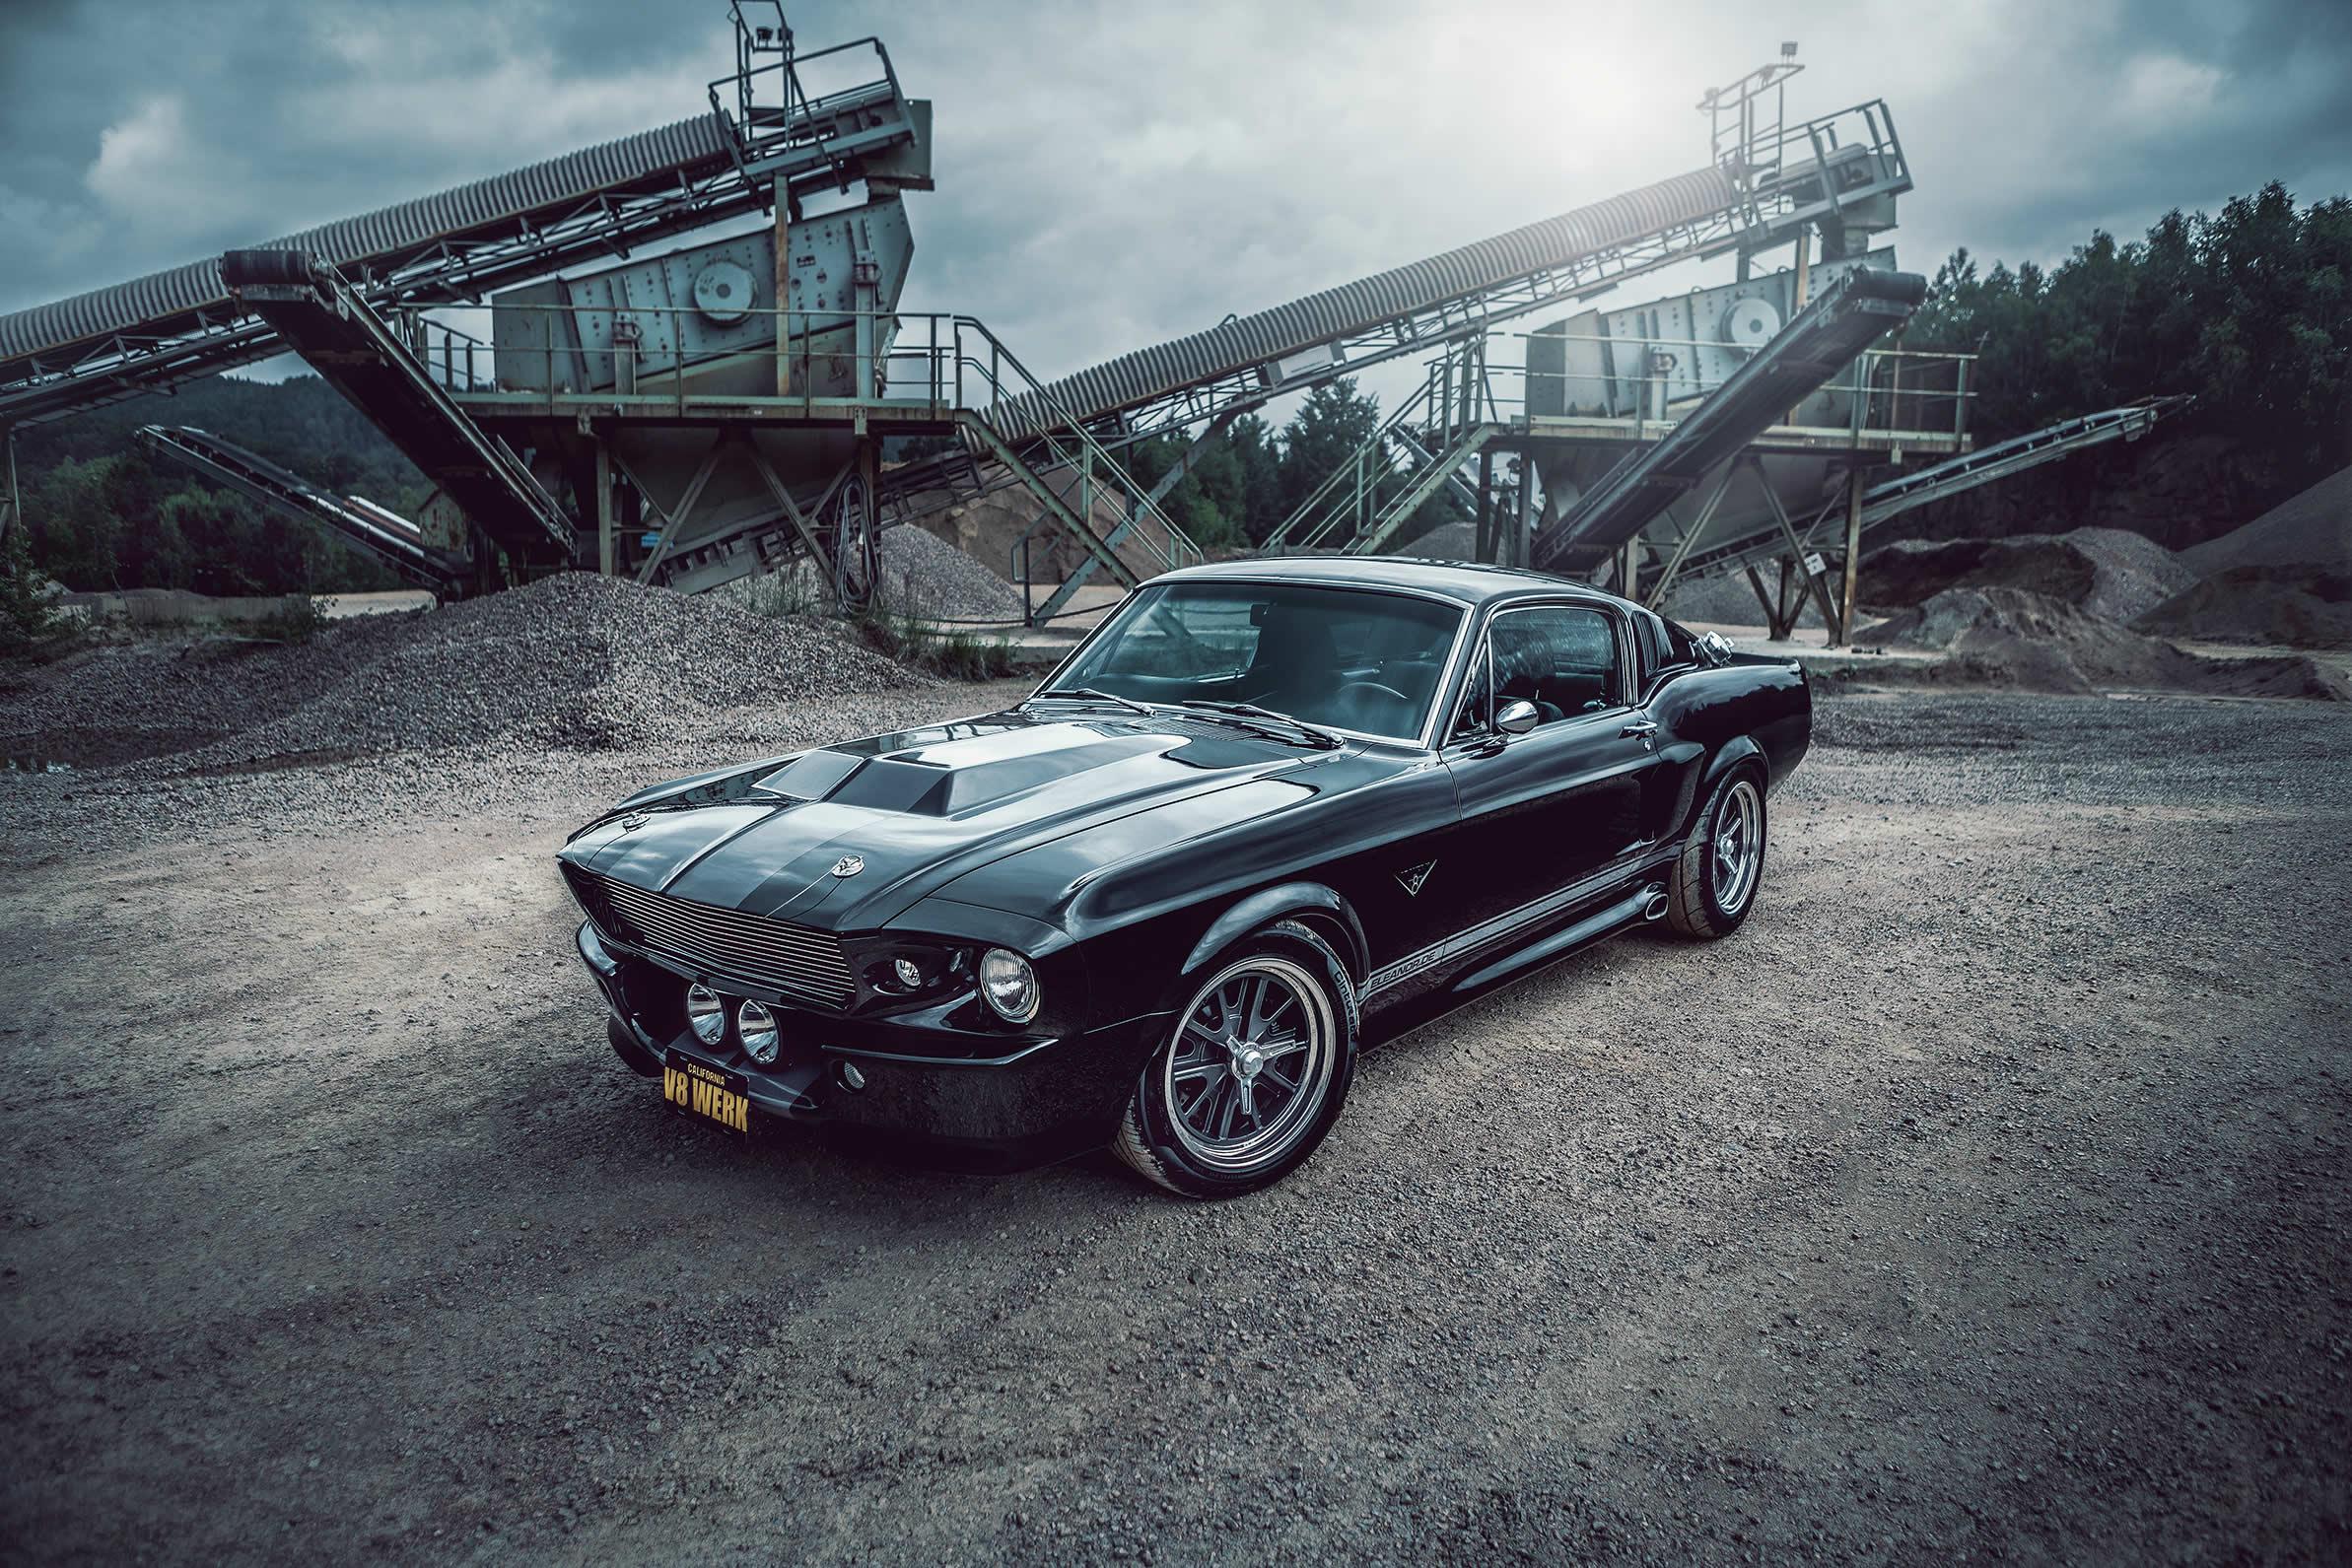 1967 Ford Mustang ELI II - ein Restomod der Extraklasse vom V8 Werk.